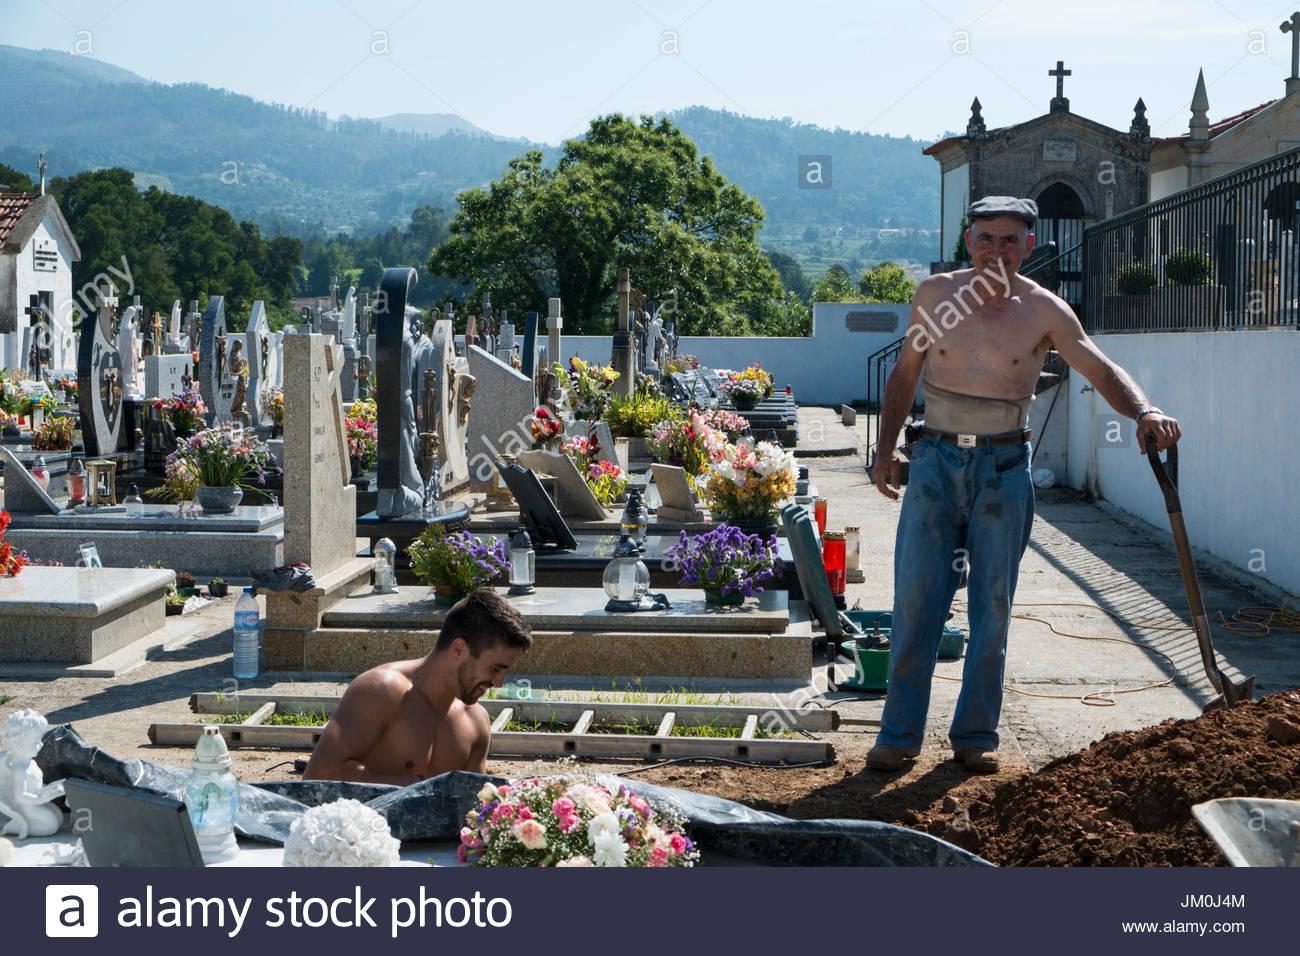 Gravediggers Along the Camino de Santiago, Portugal - Stock Image